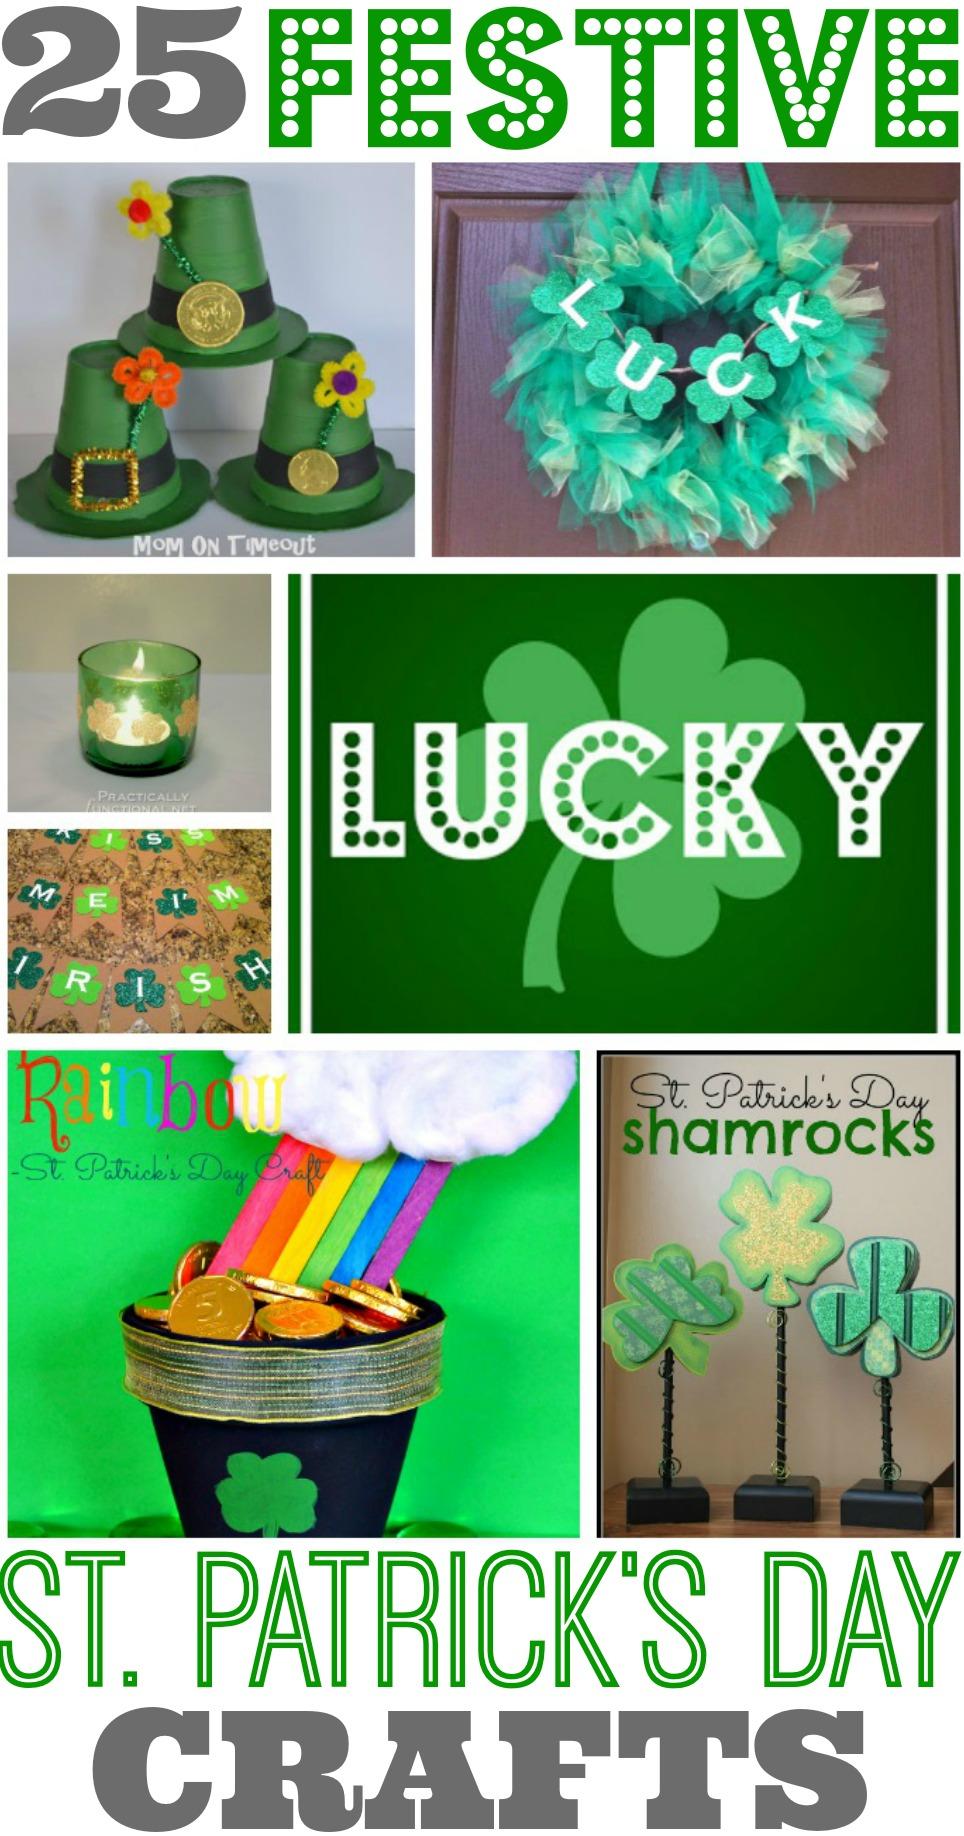 25 St Patrick's Day Crafts